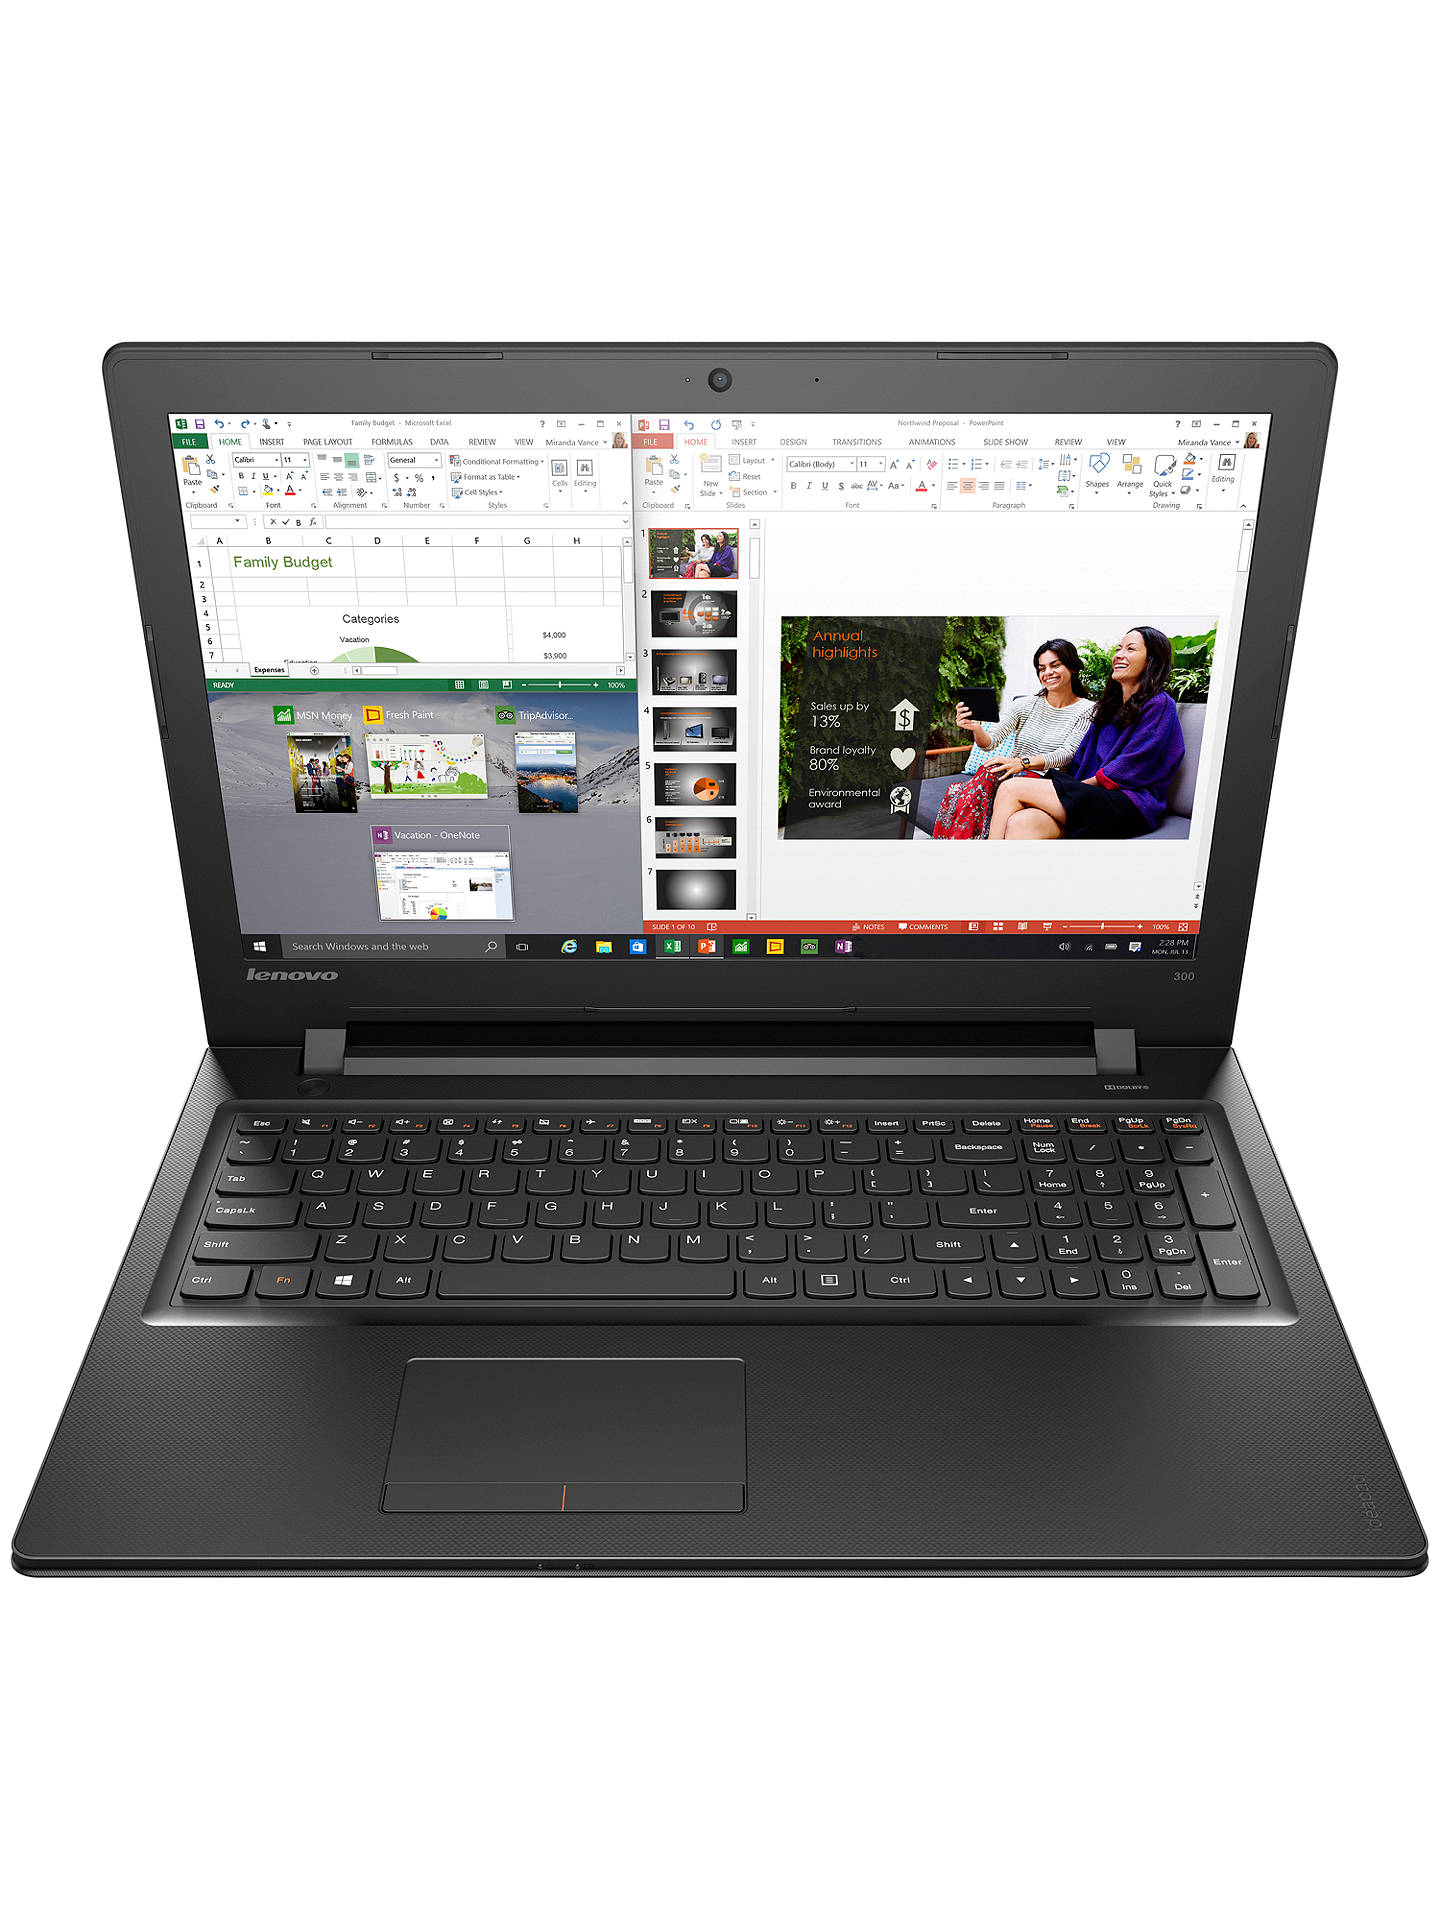 Lenovo Ideapad 300 Laptop Intel Core I5 8gb Ram 1tb 15 6 Black At John Lewis Partners